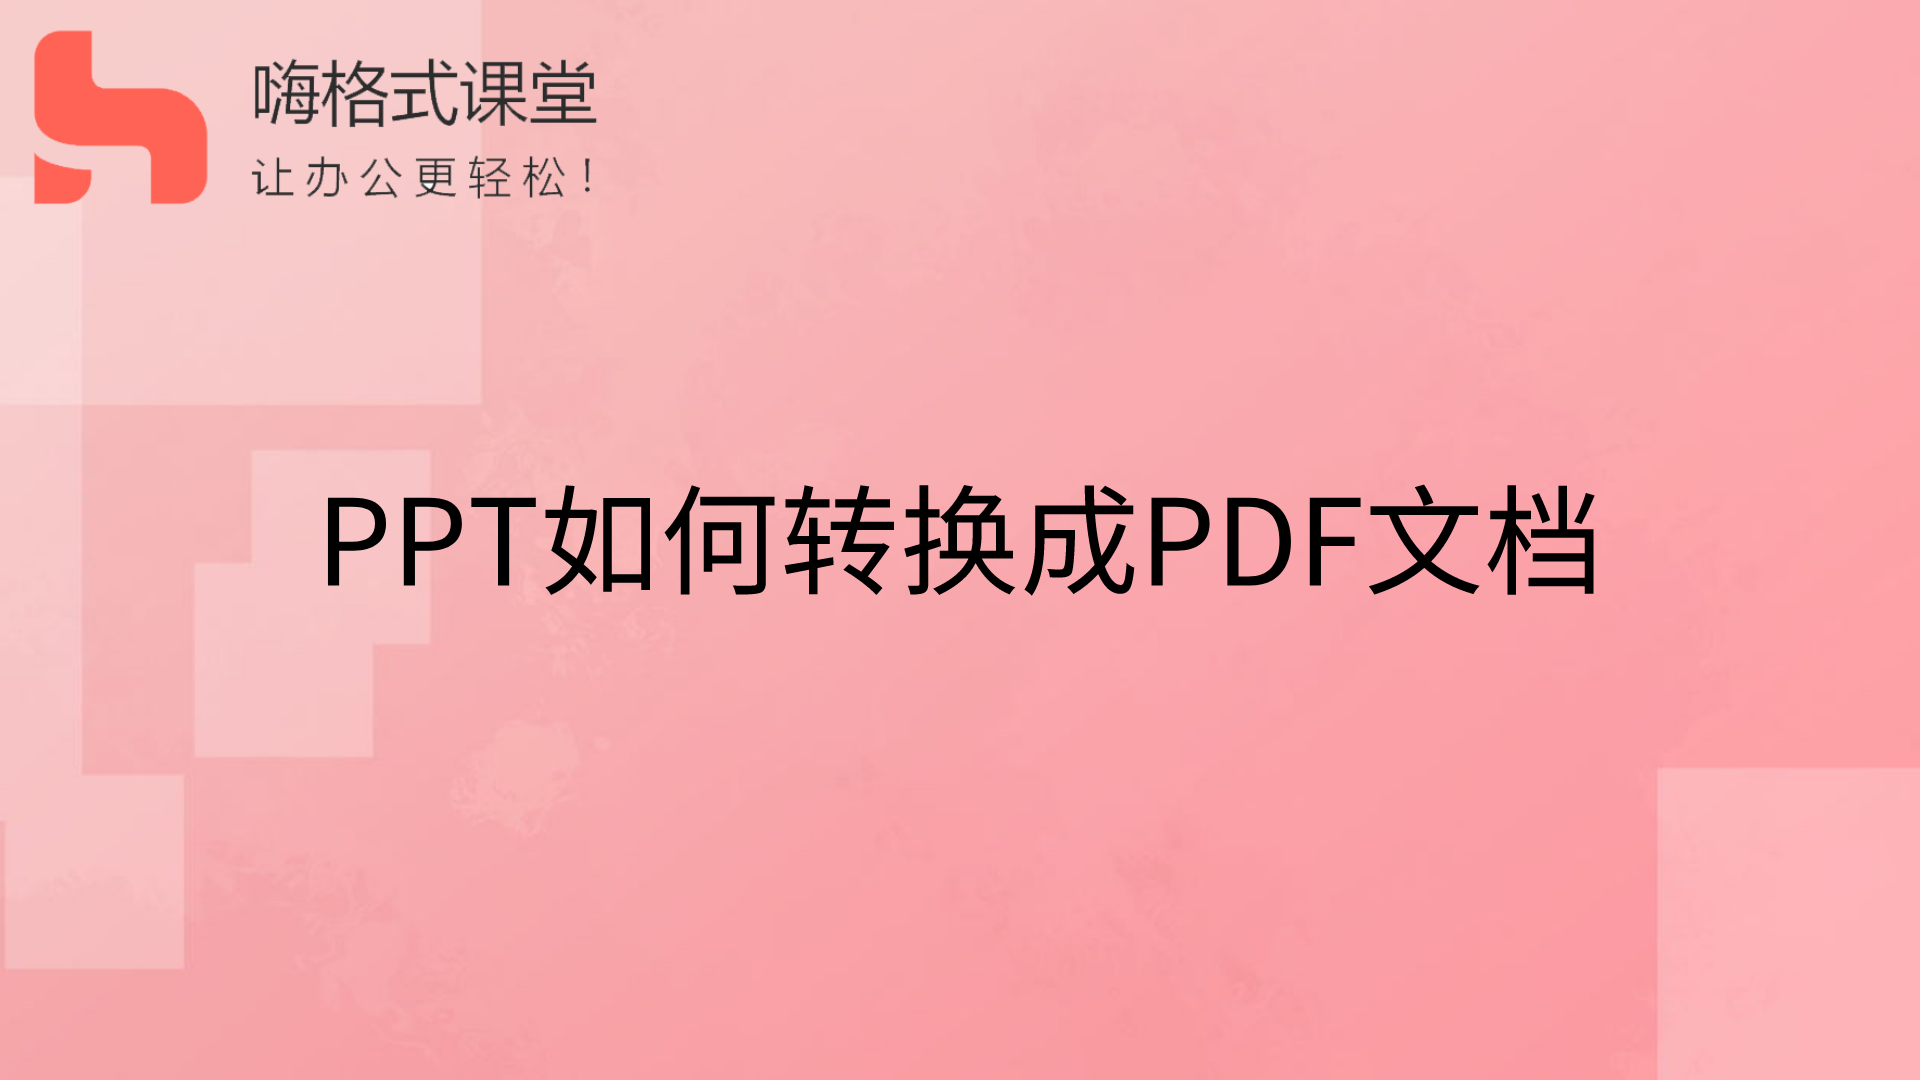 PPT如何转换成PDF文档s